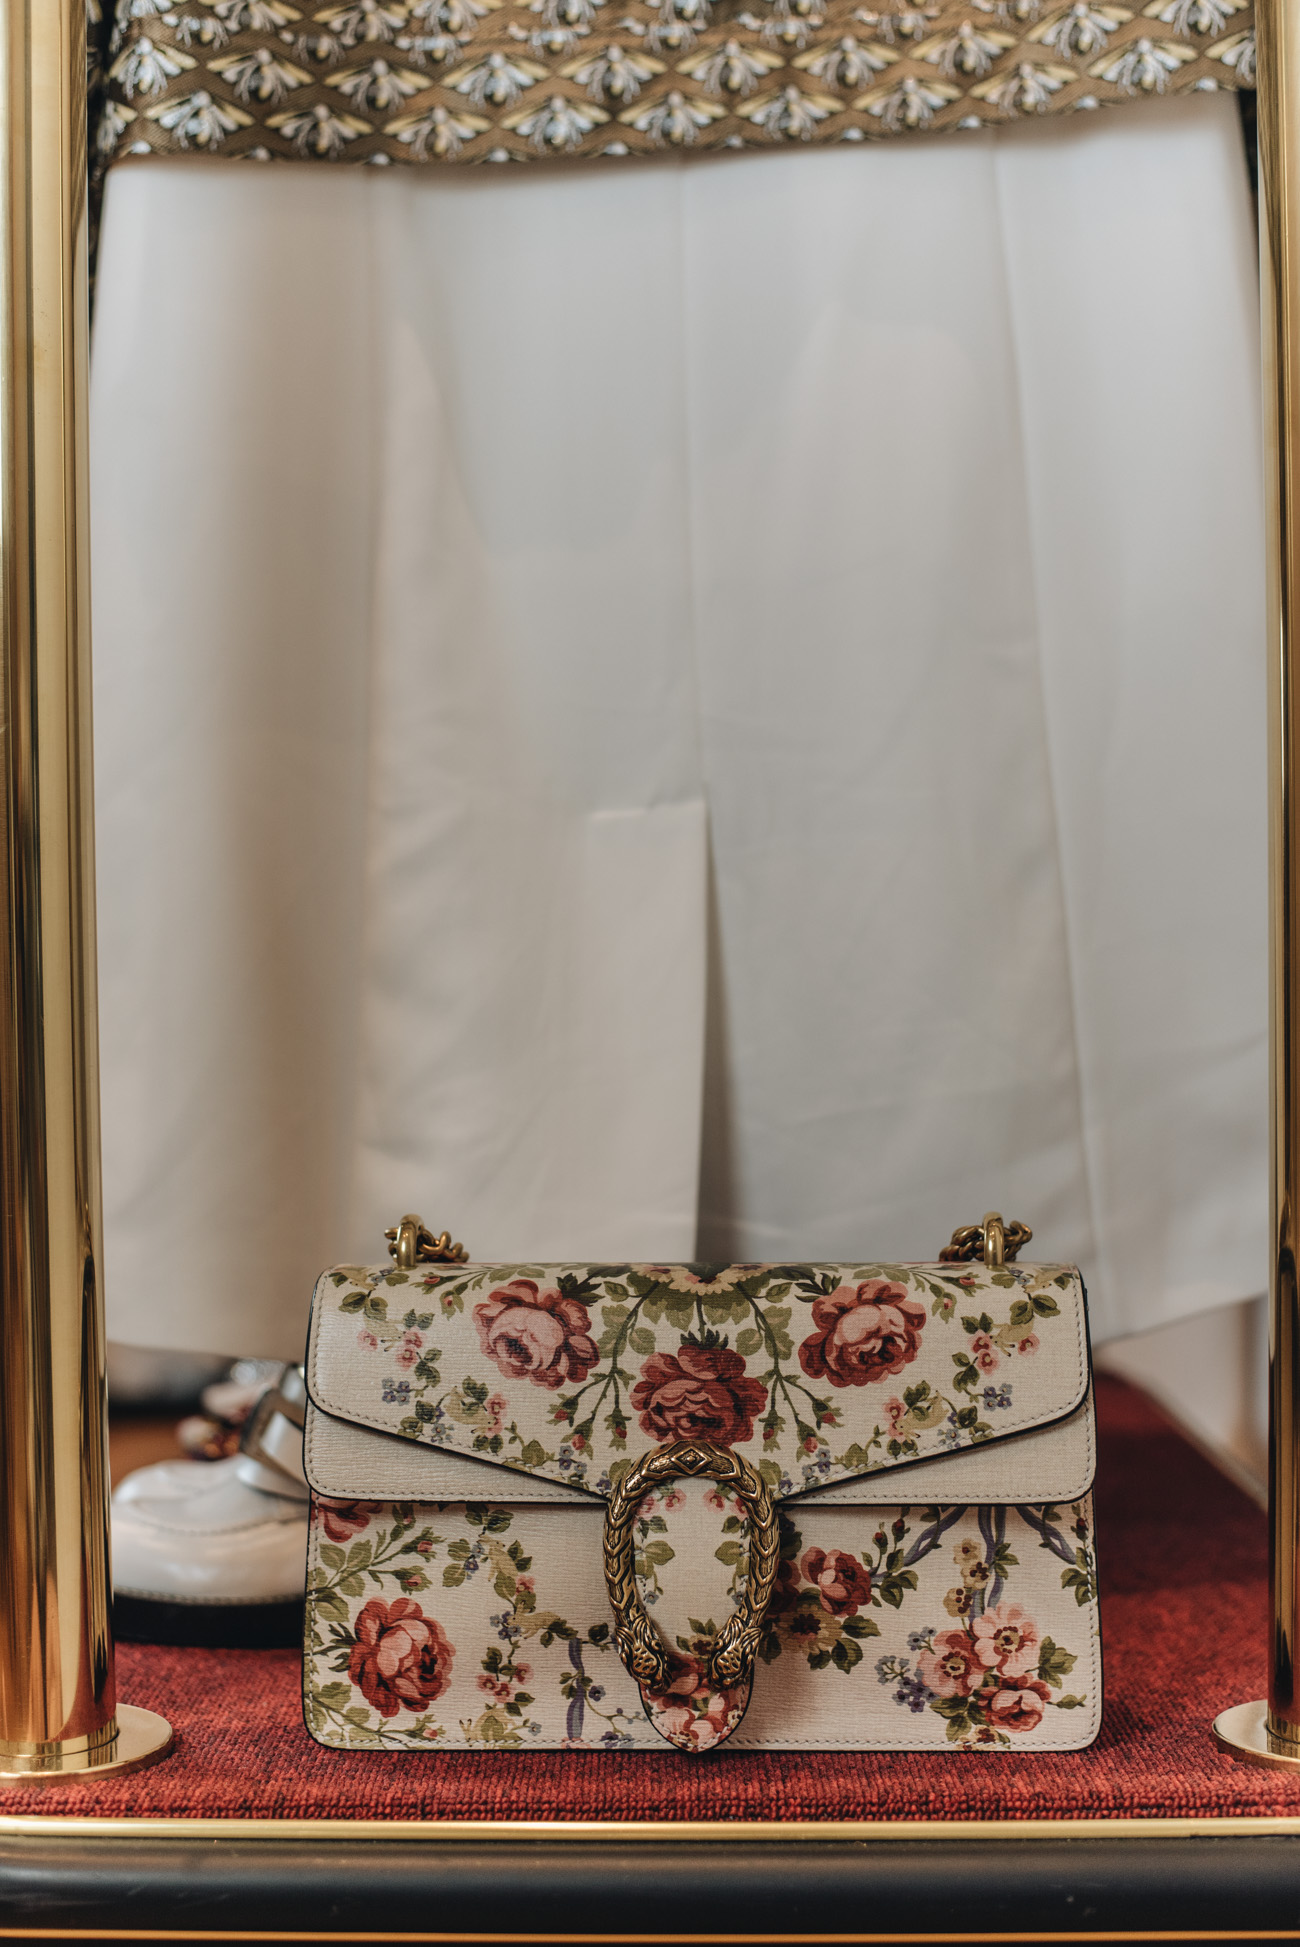 Dionysus-GG-Supreme-aus-der-Gucci-Capsule-Collection-für-net-a-porter-com-fashiioncarpet